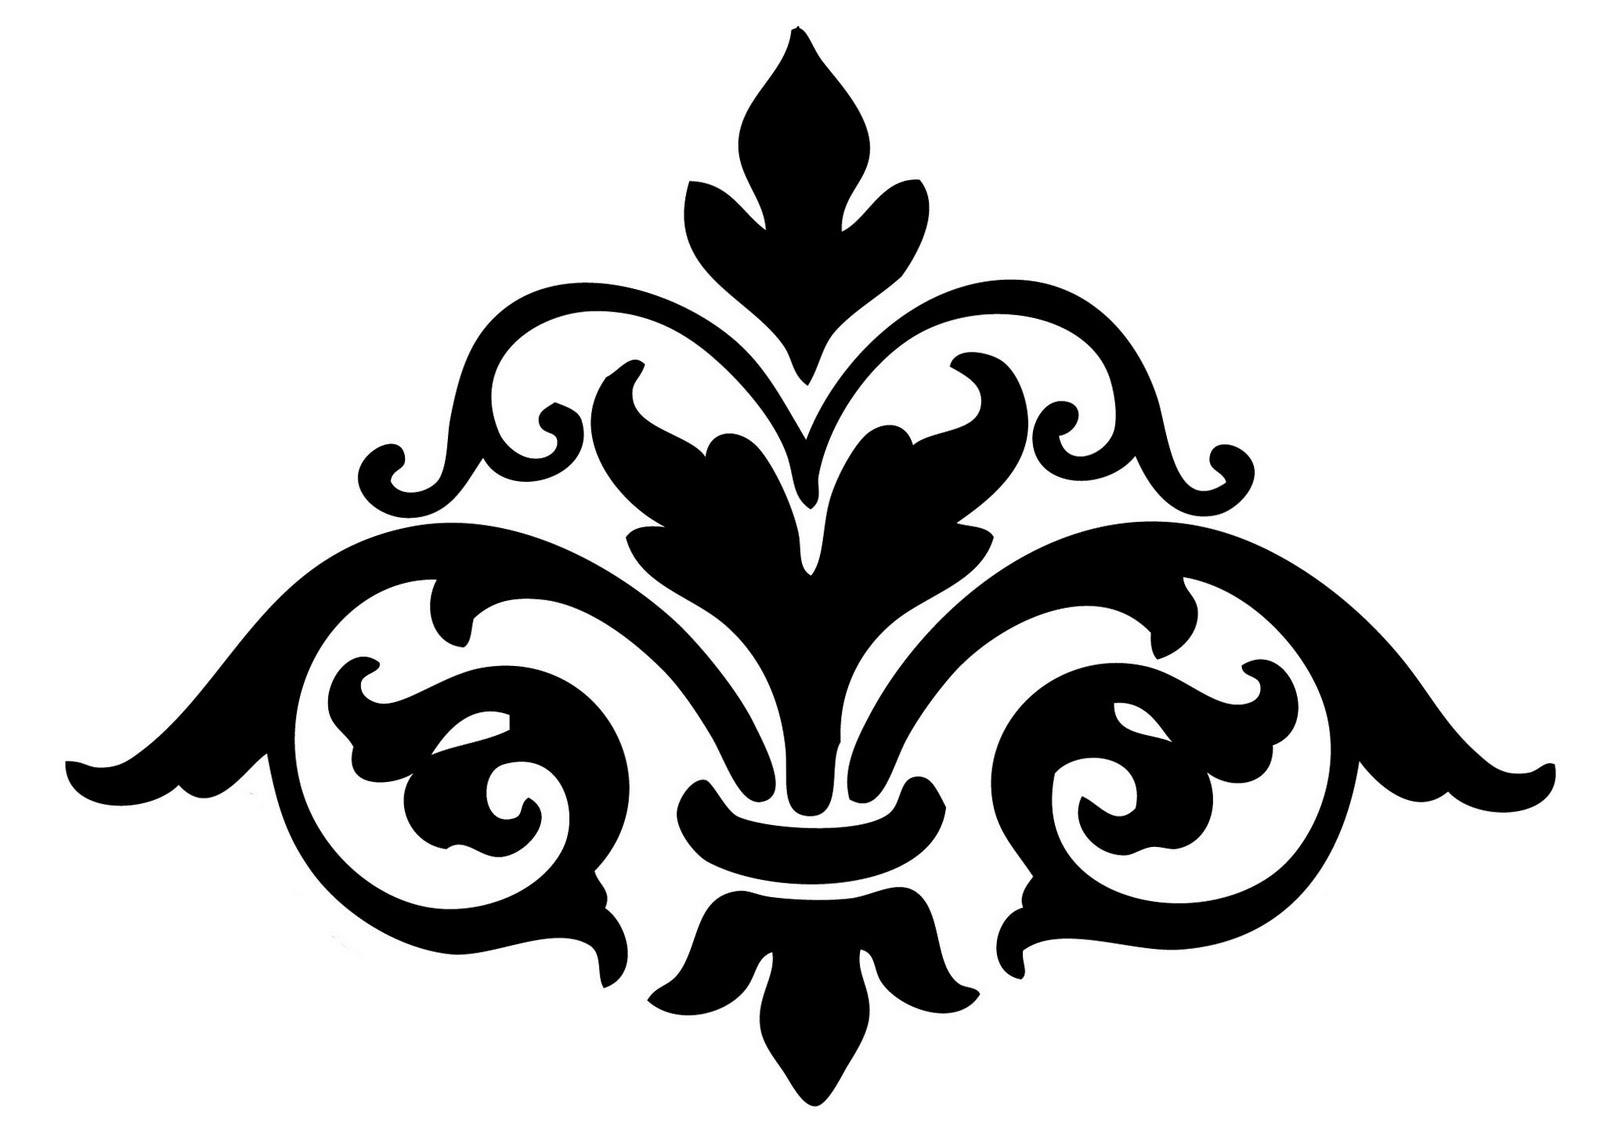 Free Stencil Pattern Cliparts, Download Free Clip Art, Free Clip Art - Free Printable Lace Stencil